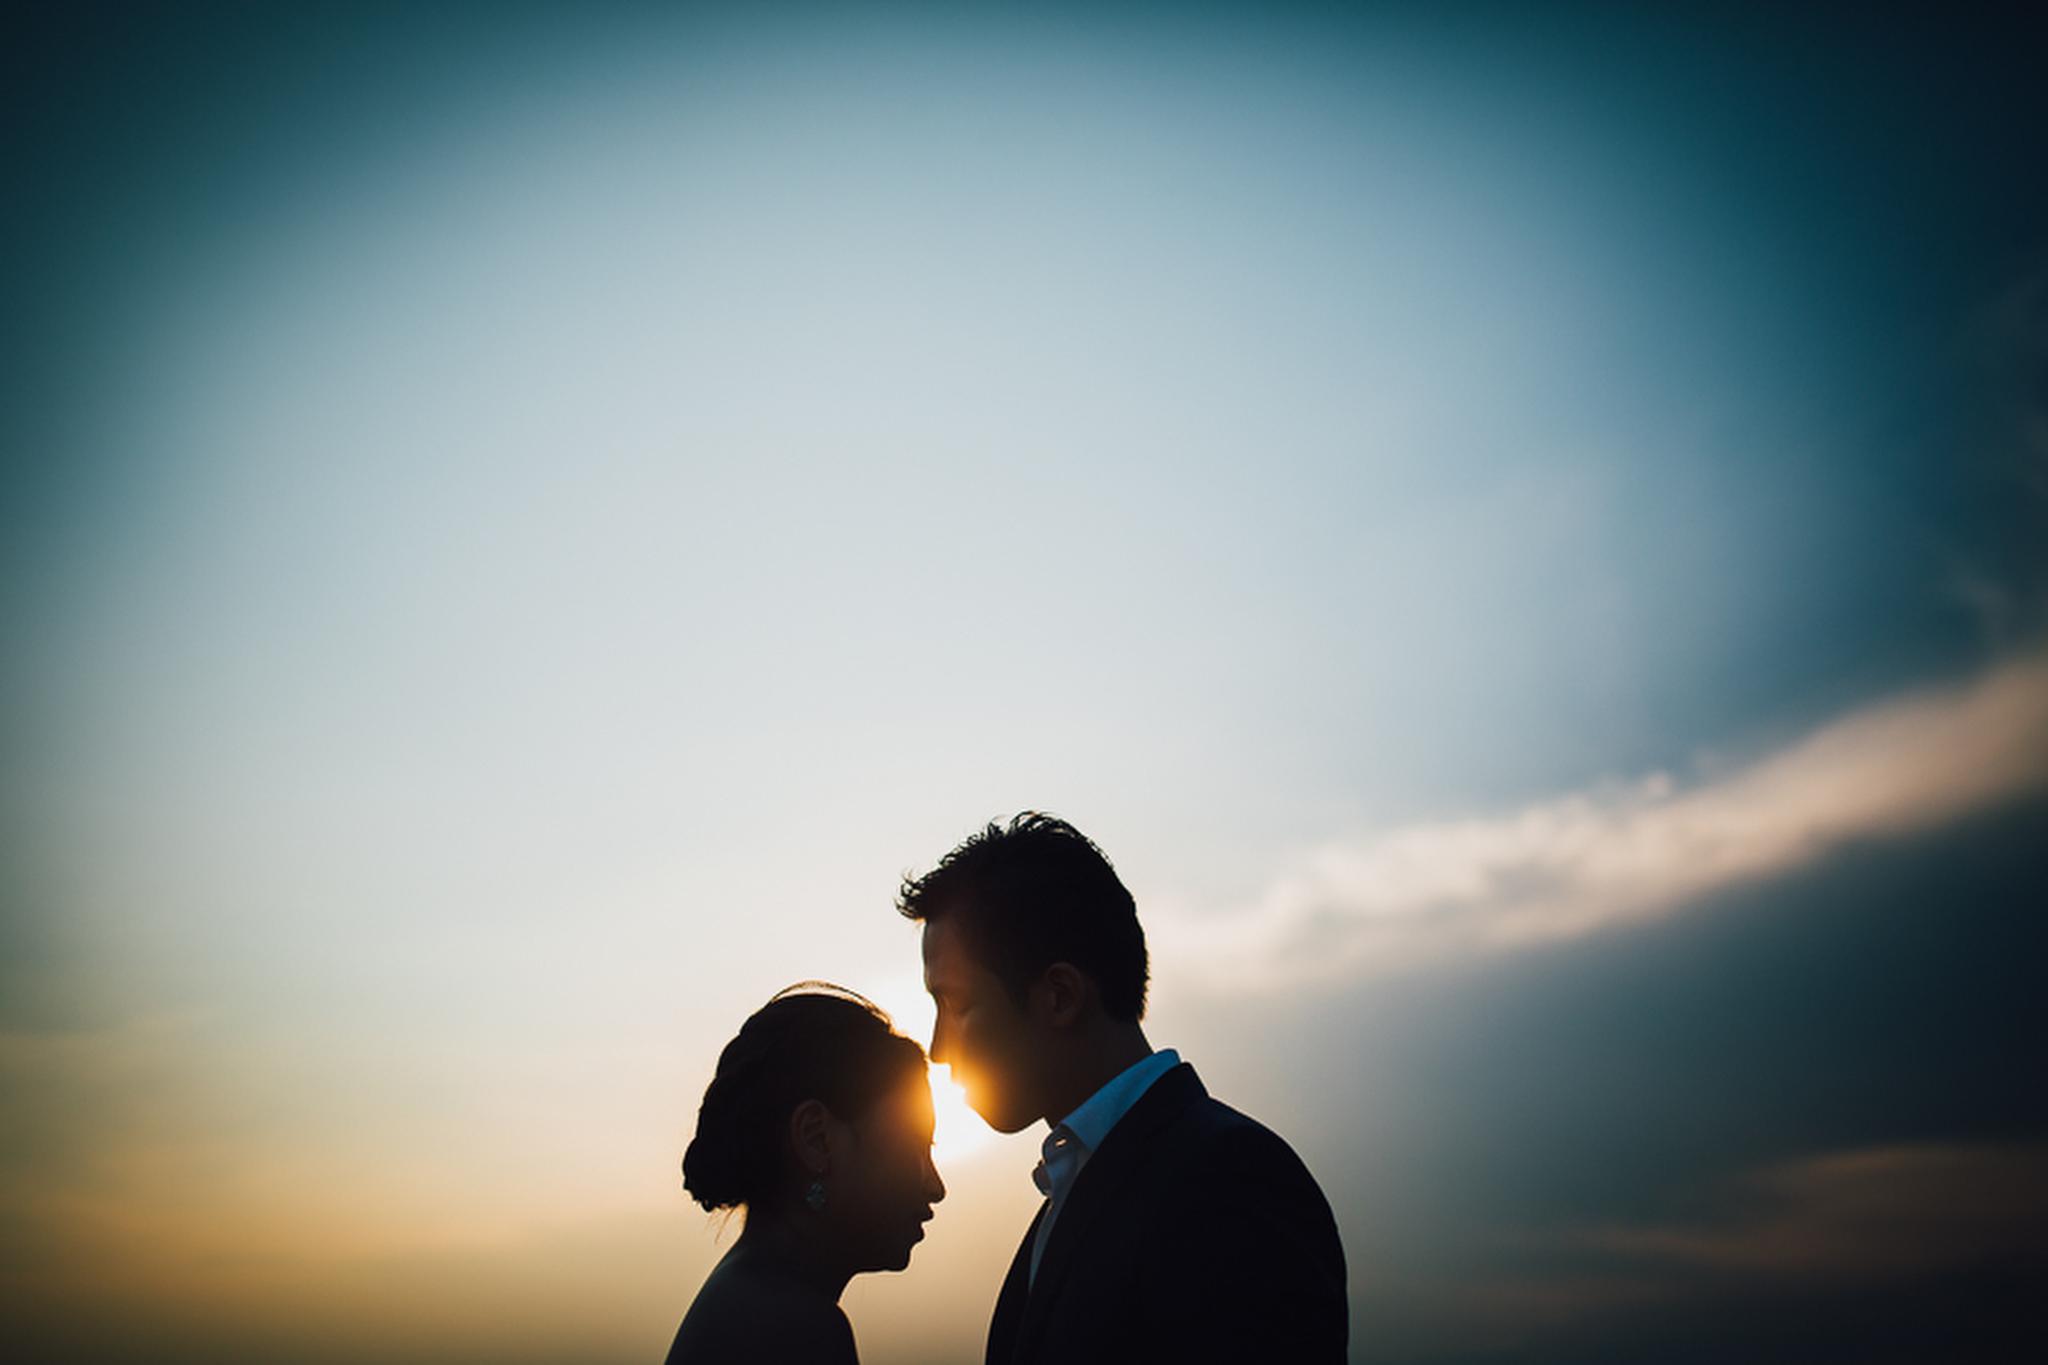 Singapore Wedding Photographer - Weisheng & Justina (47 of 47).JPG